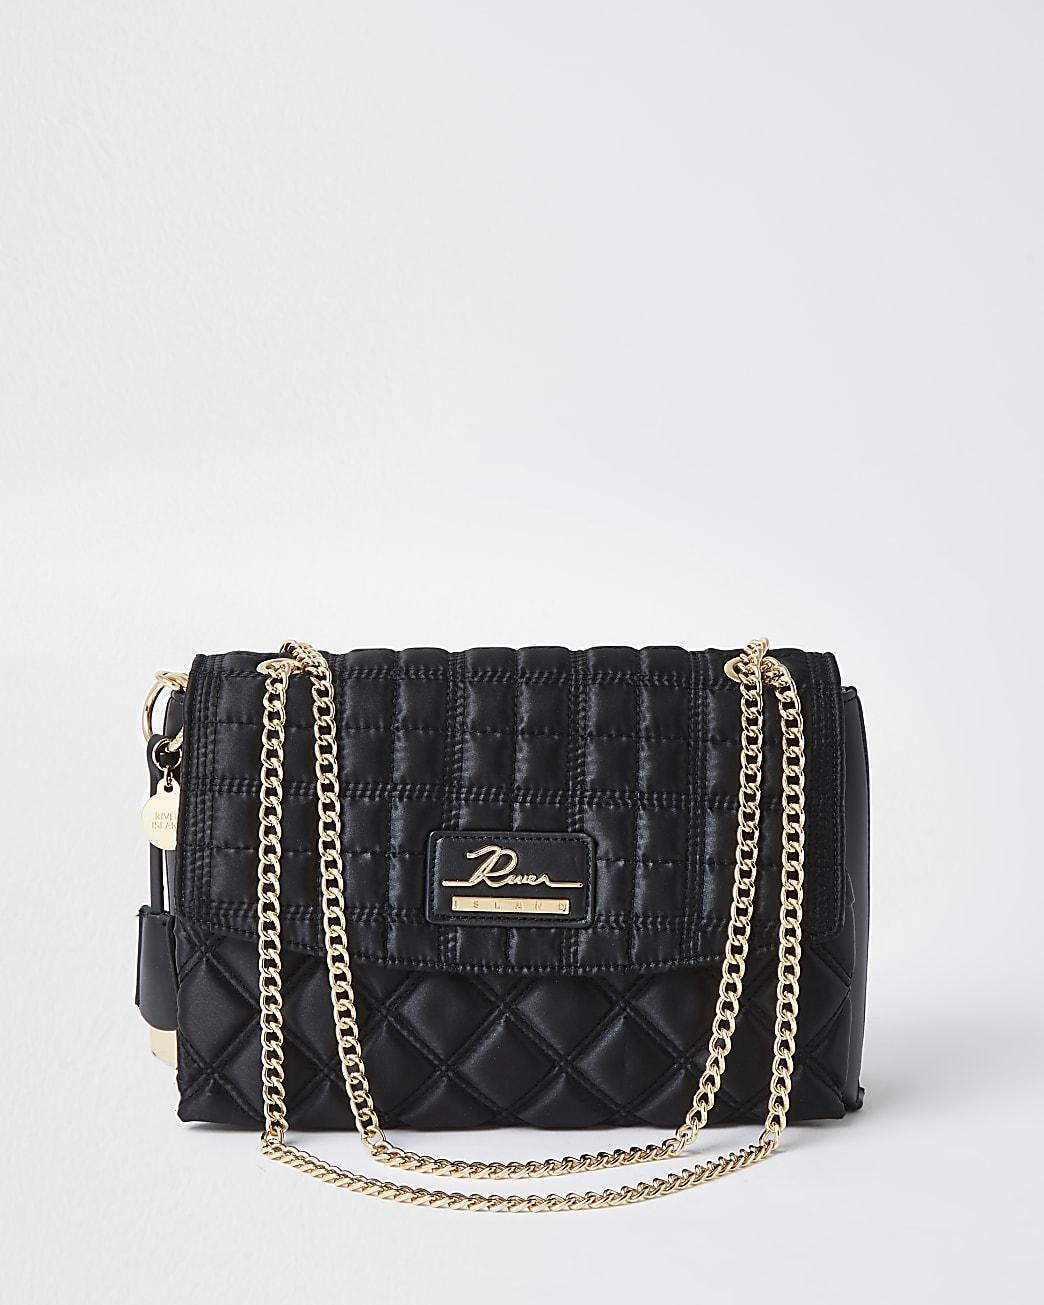 Black quilted satchel